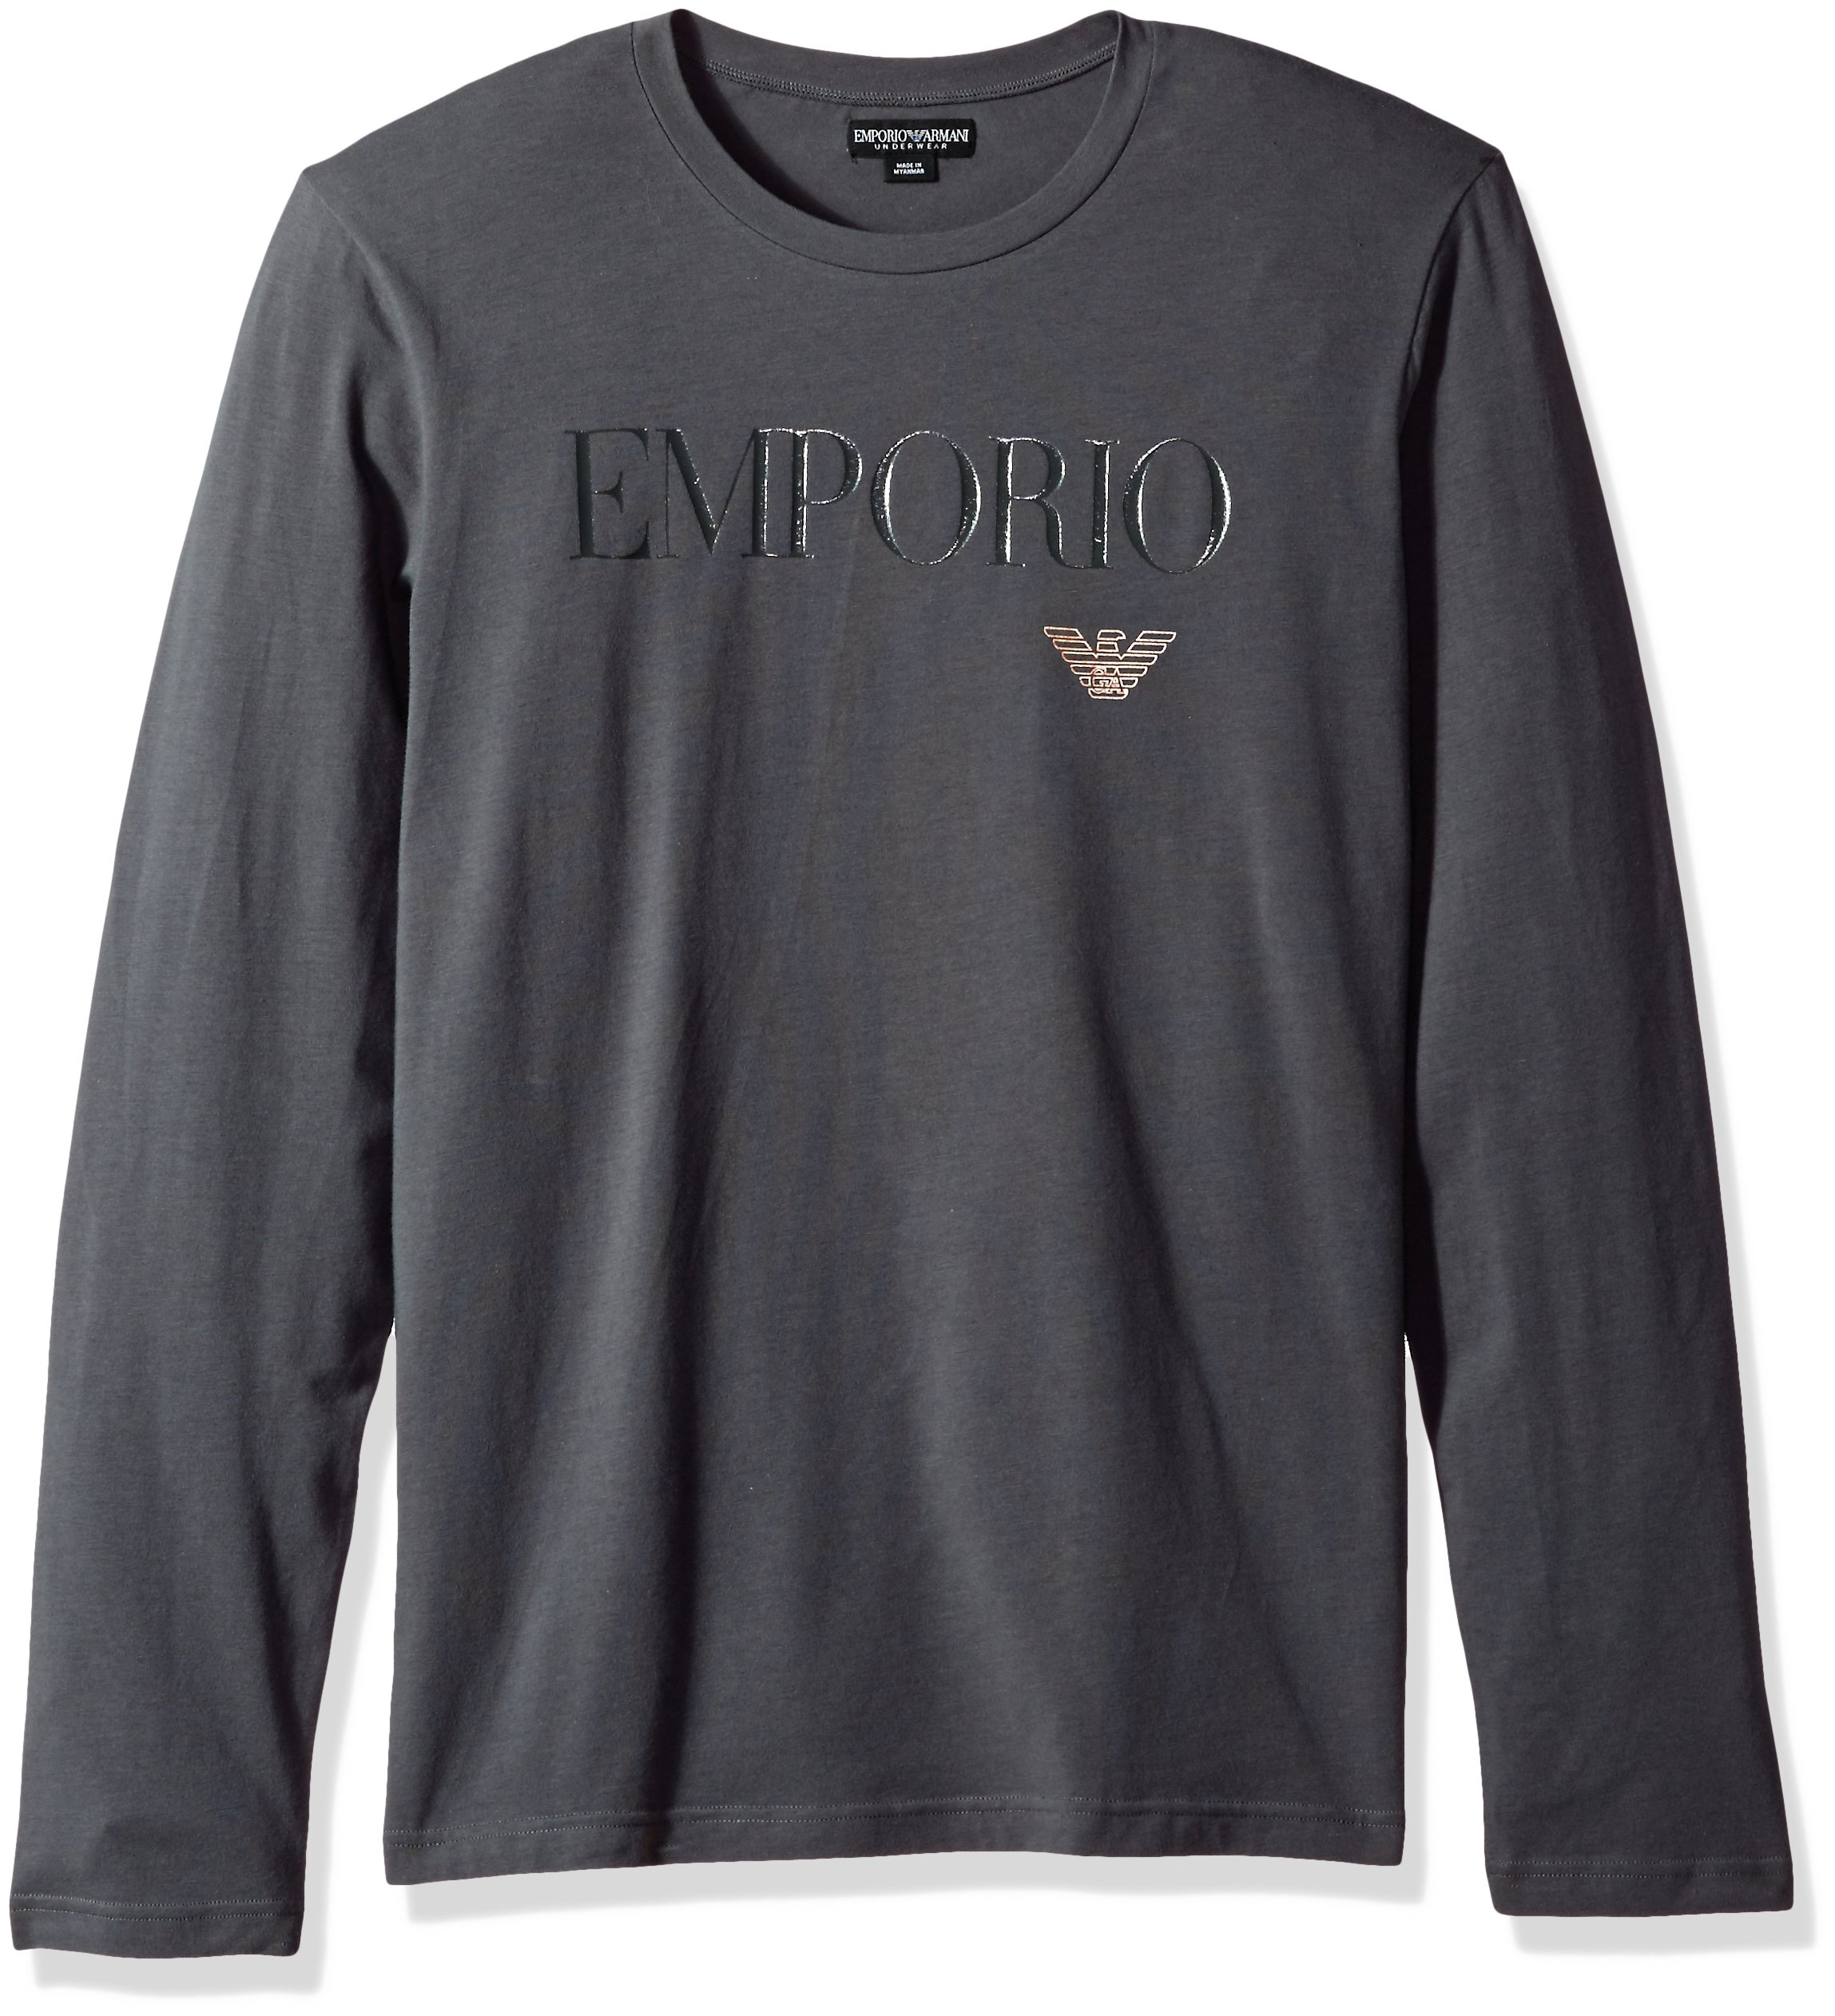 Emporio Armani Men's Megalogo L/s Crew T-Shirt, Dark Gray, M